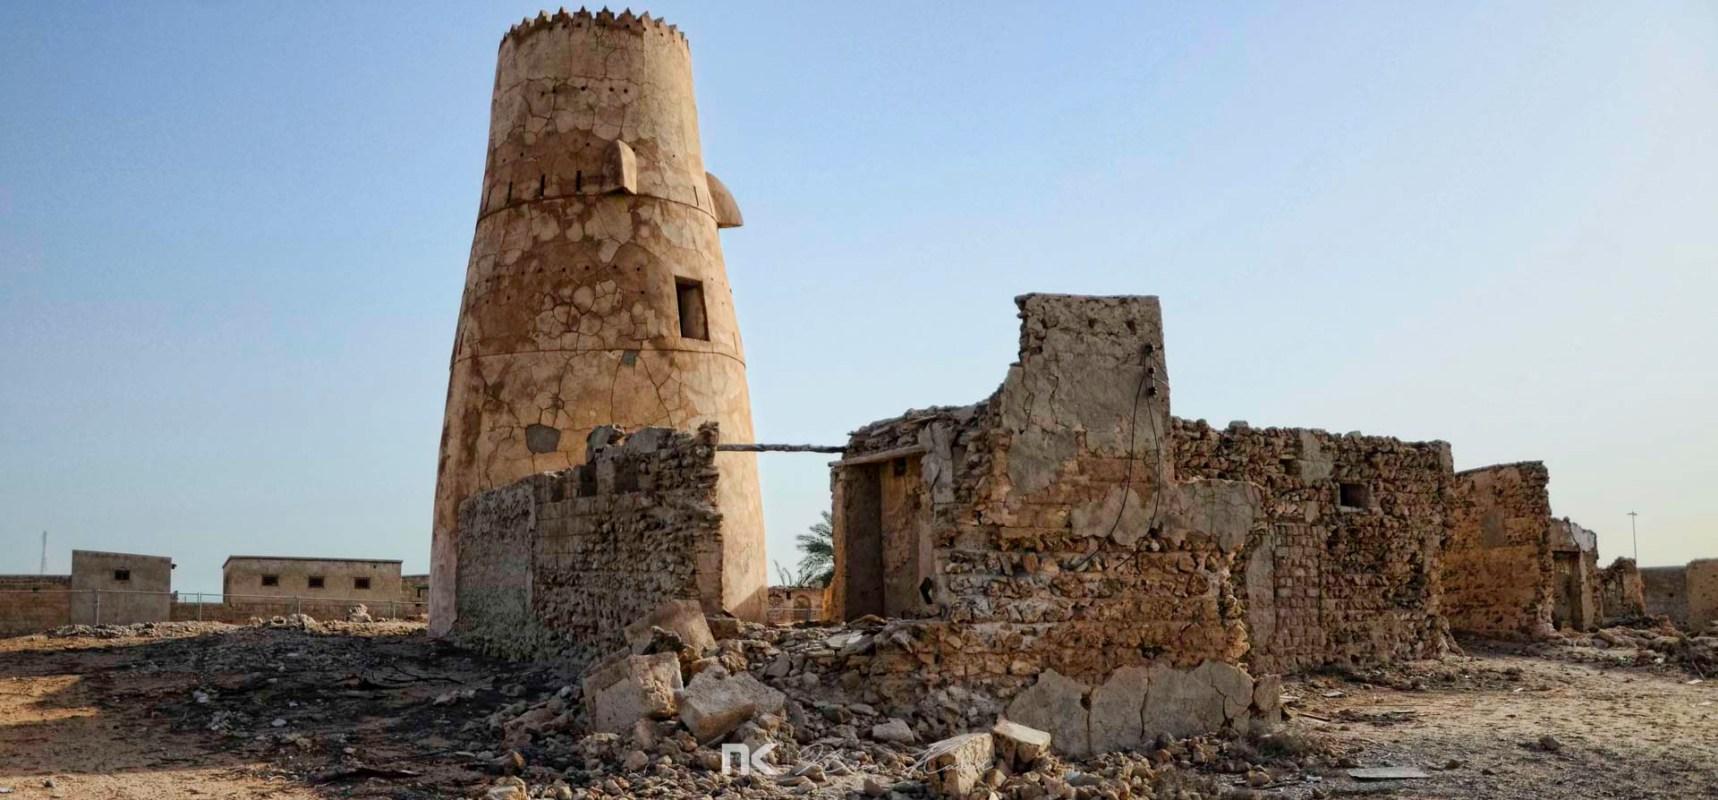 Jazirat-Al-Hamra-20